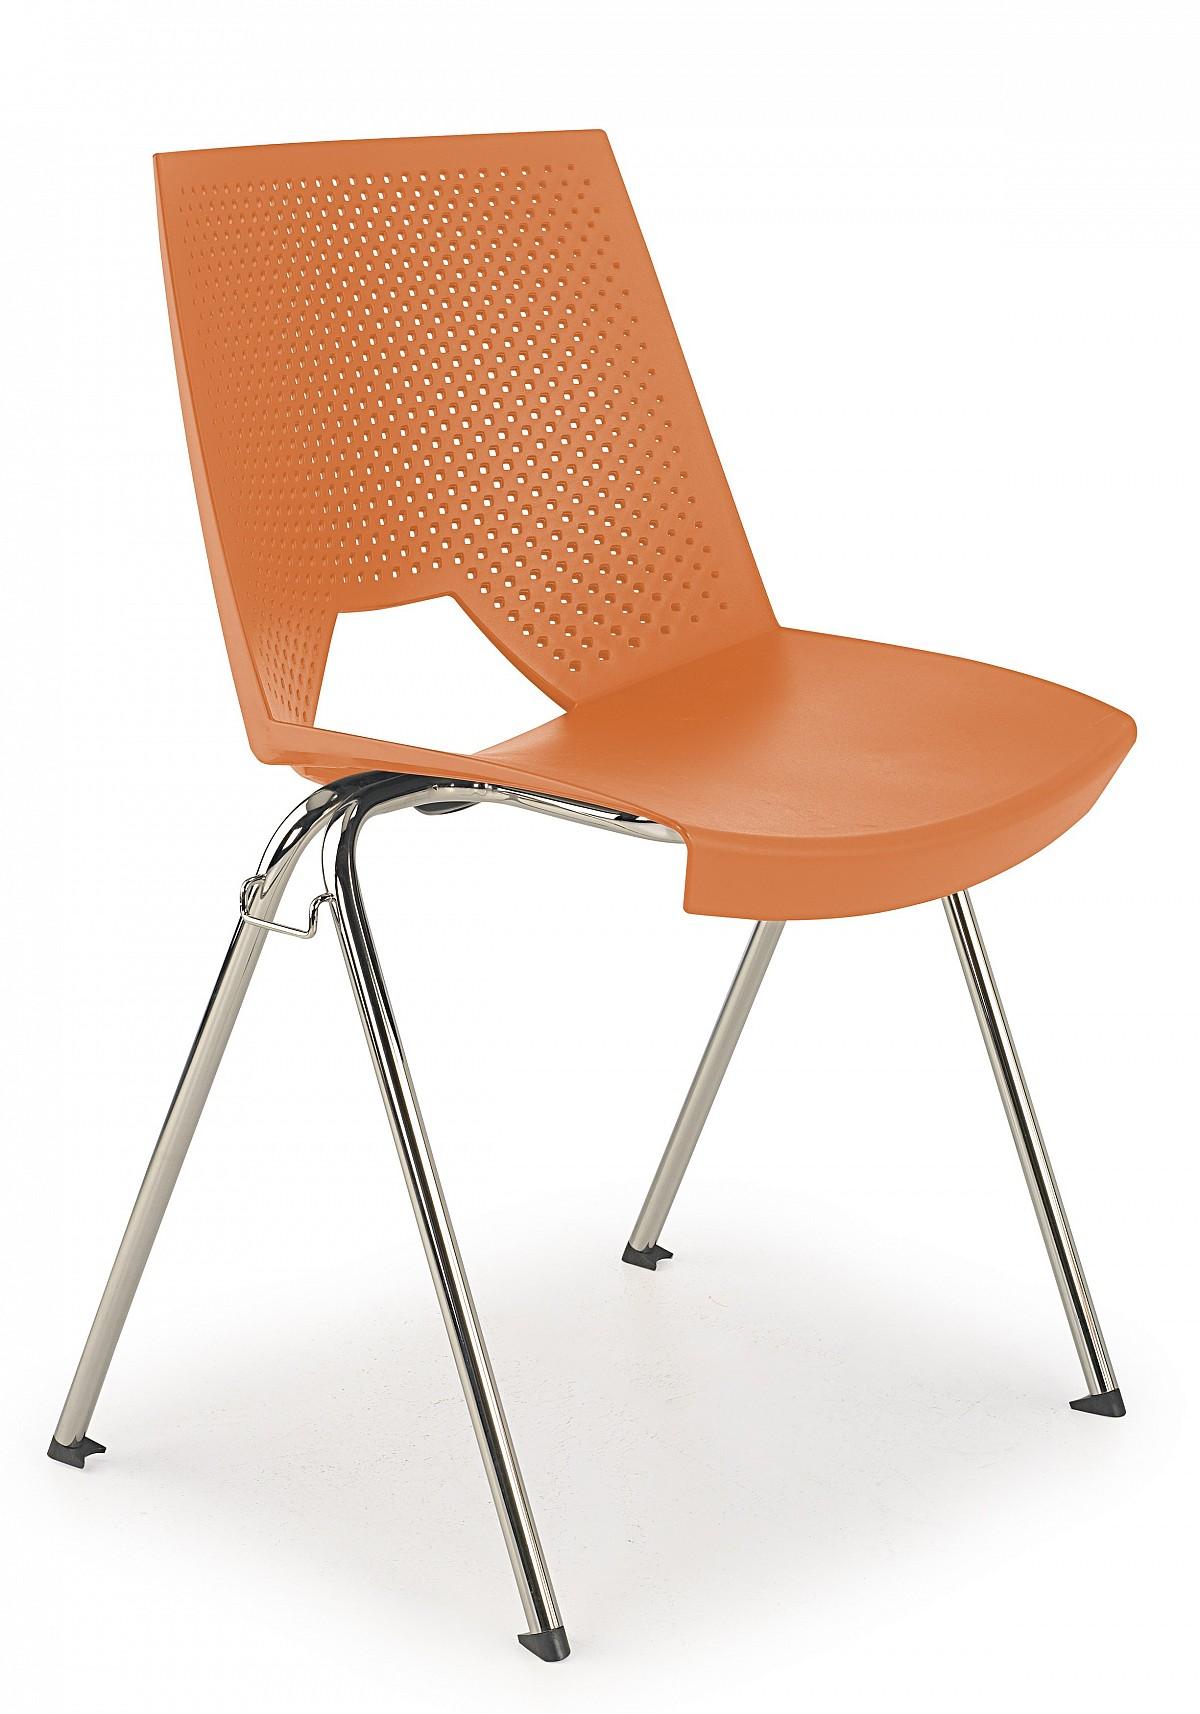 Sillas con ruedas o sillas sin ruedas cu ndo usar cada for Silla comedor para ninos